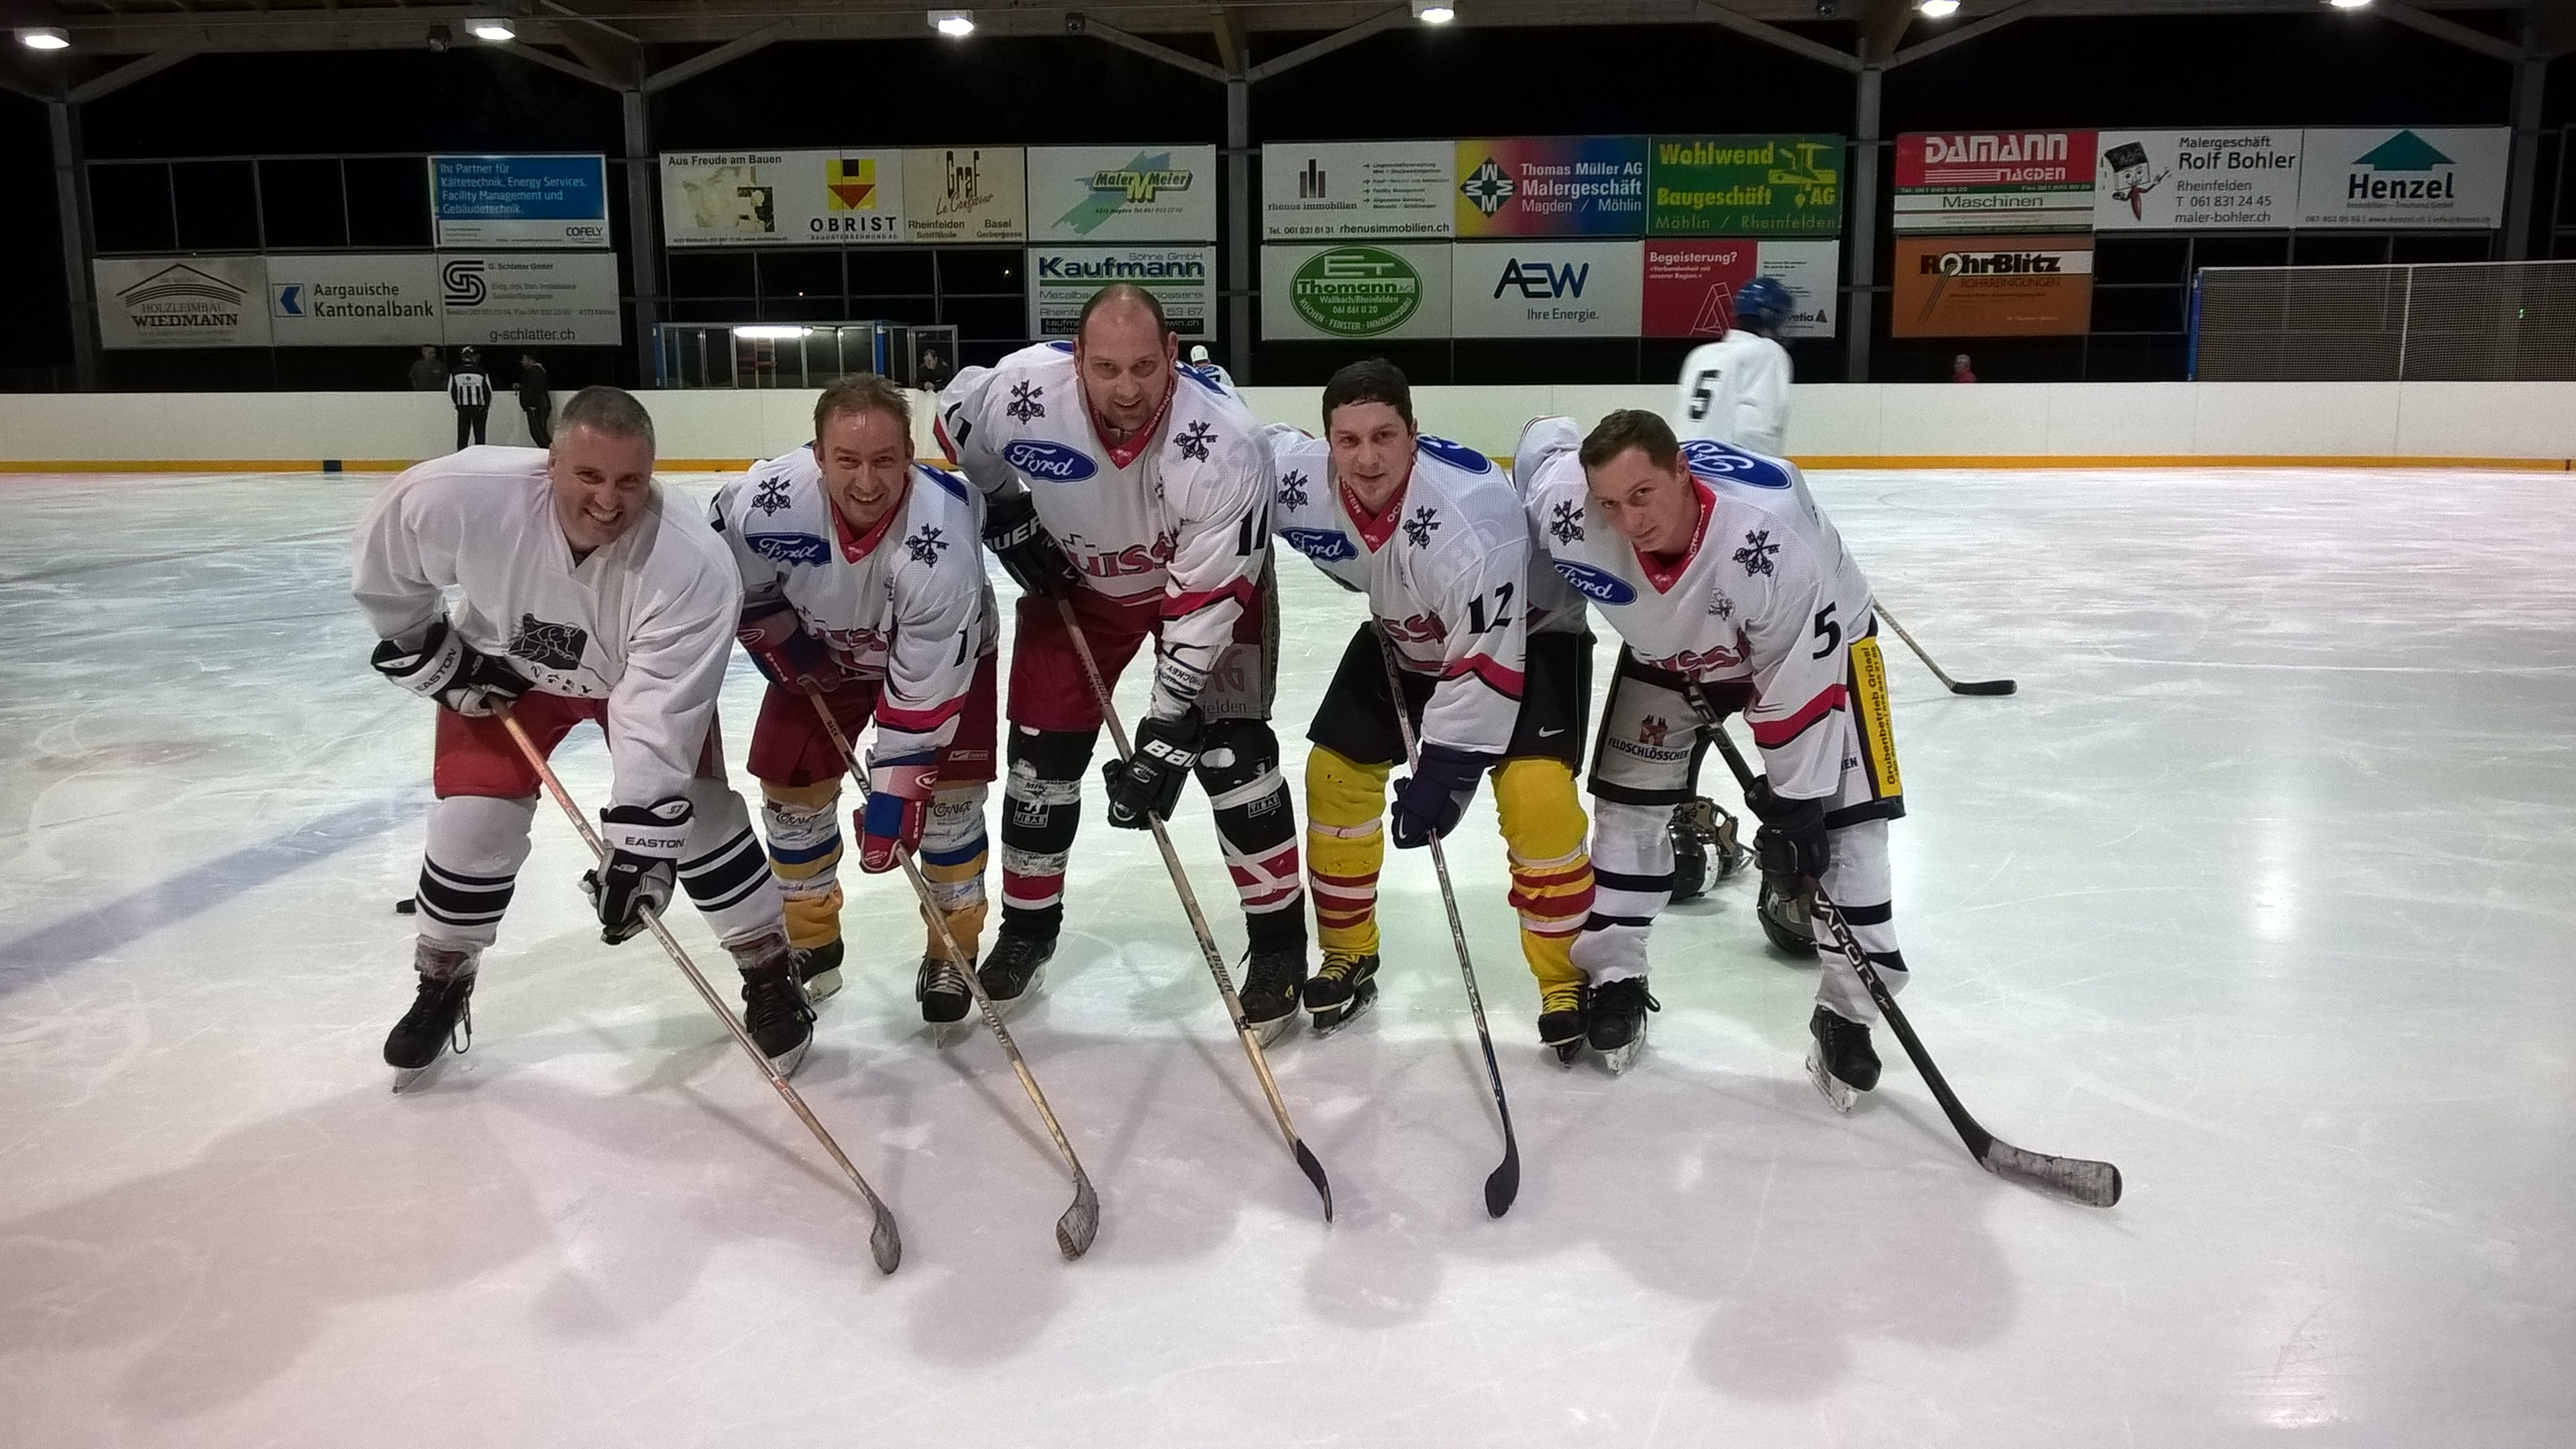 Eishockeymatch – Rheinfelden vs. Badisch Rheinfelden